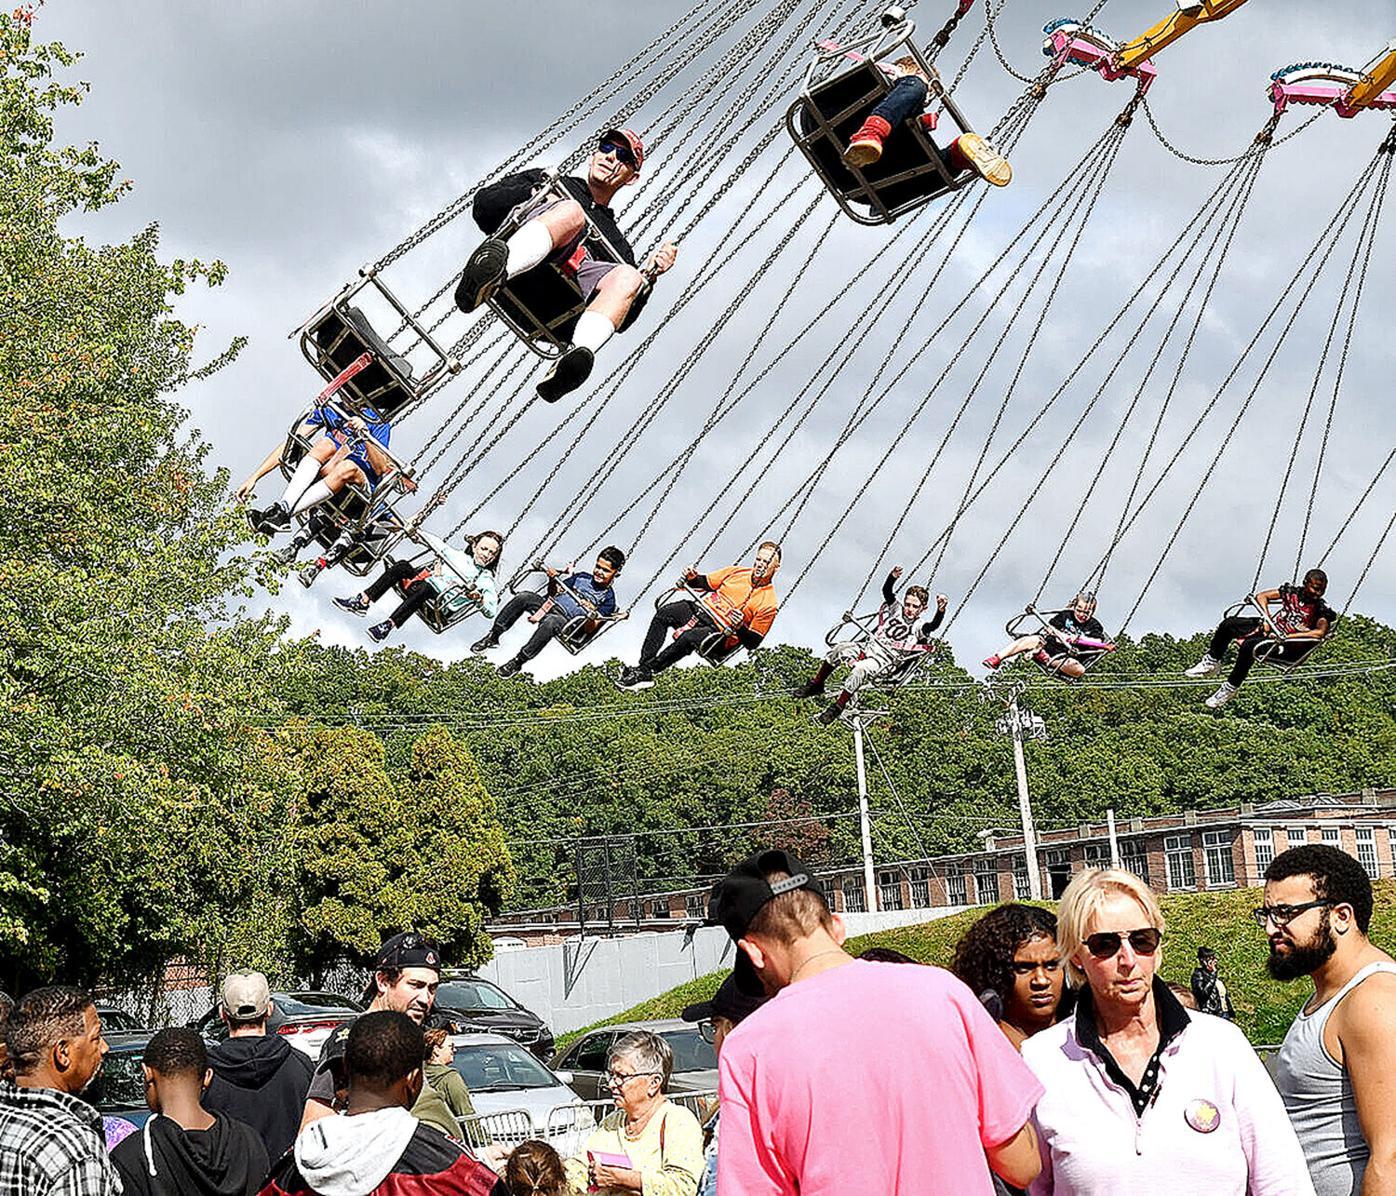 Autumnfest Swing Carousel Ride